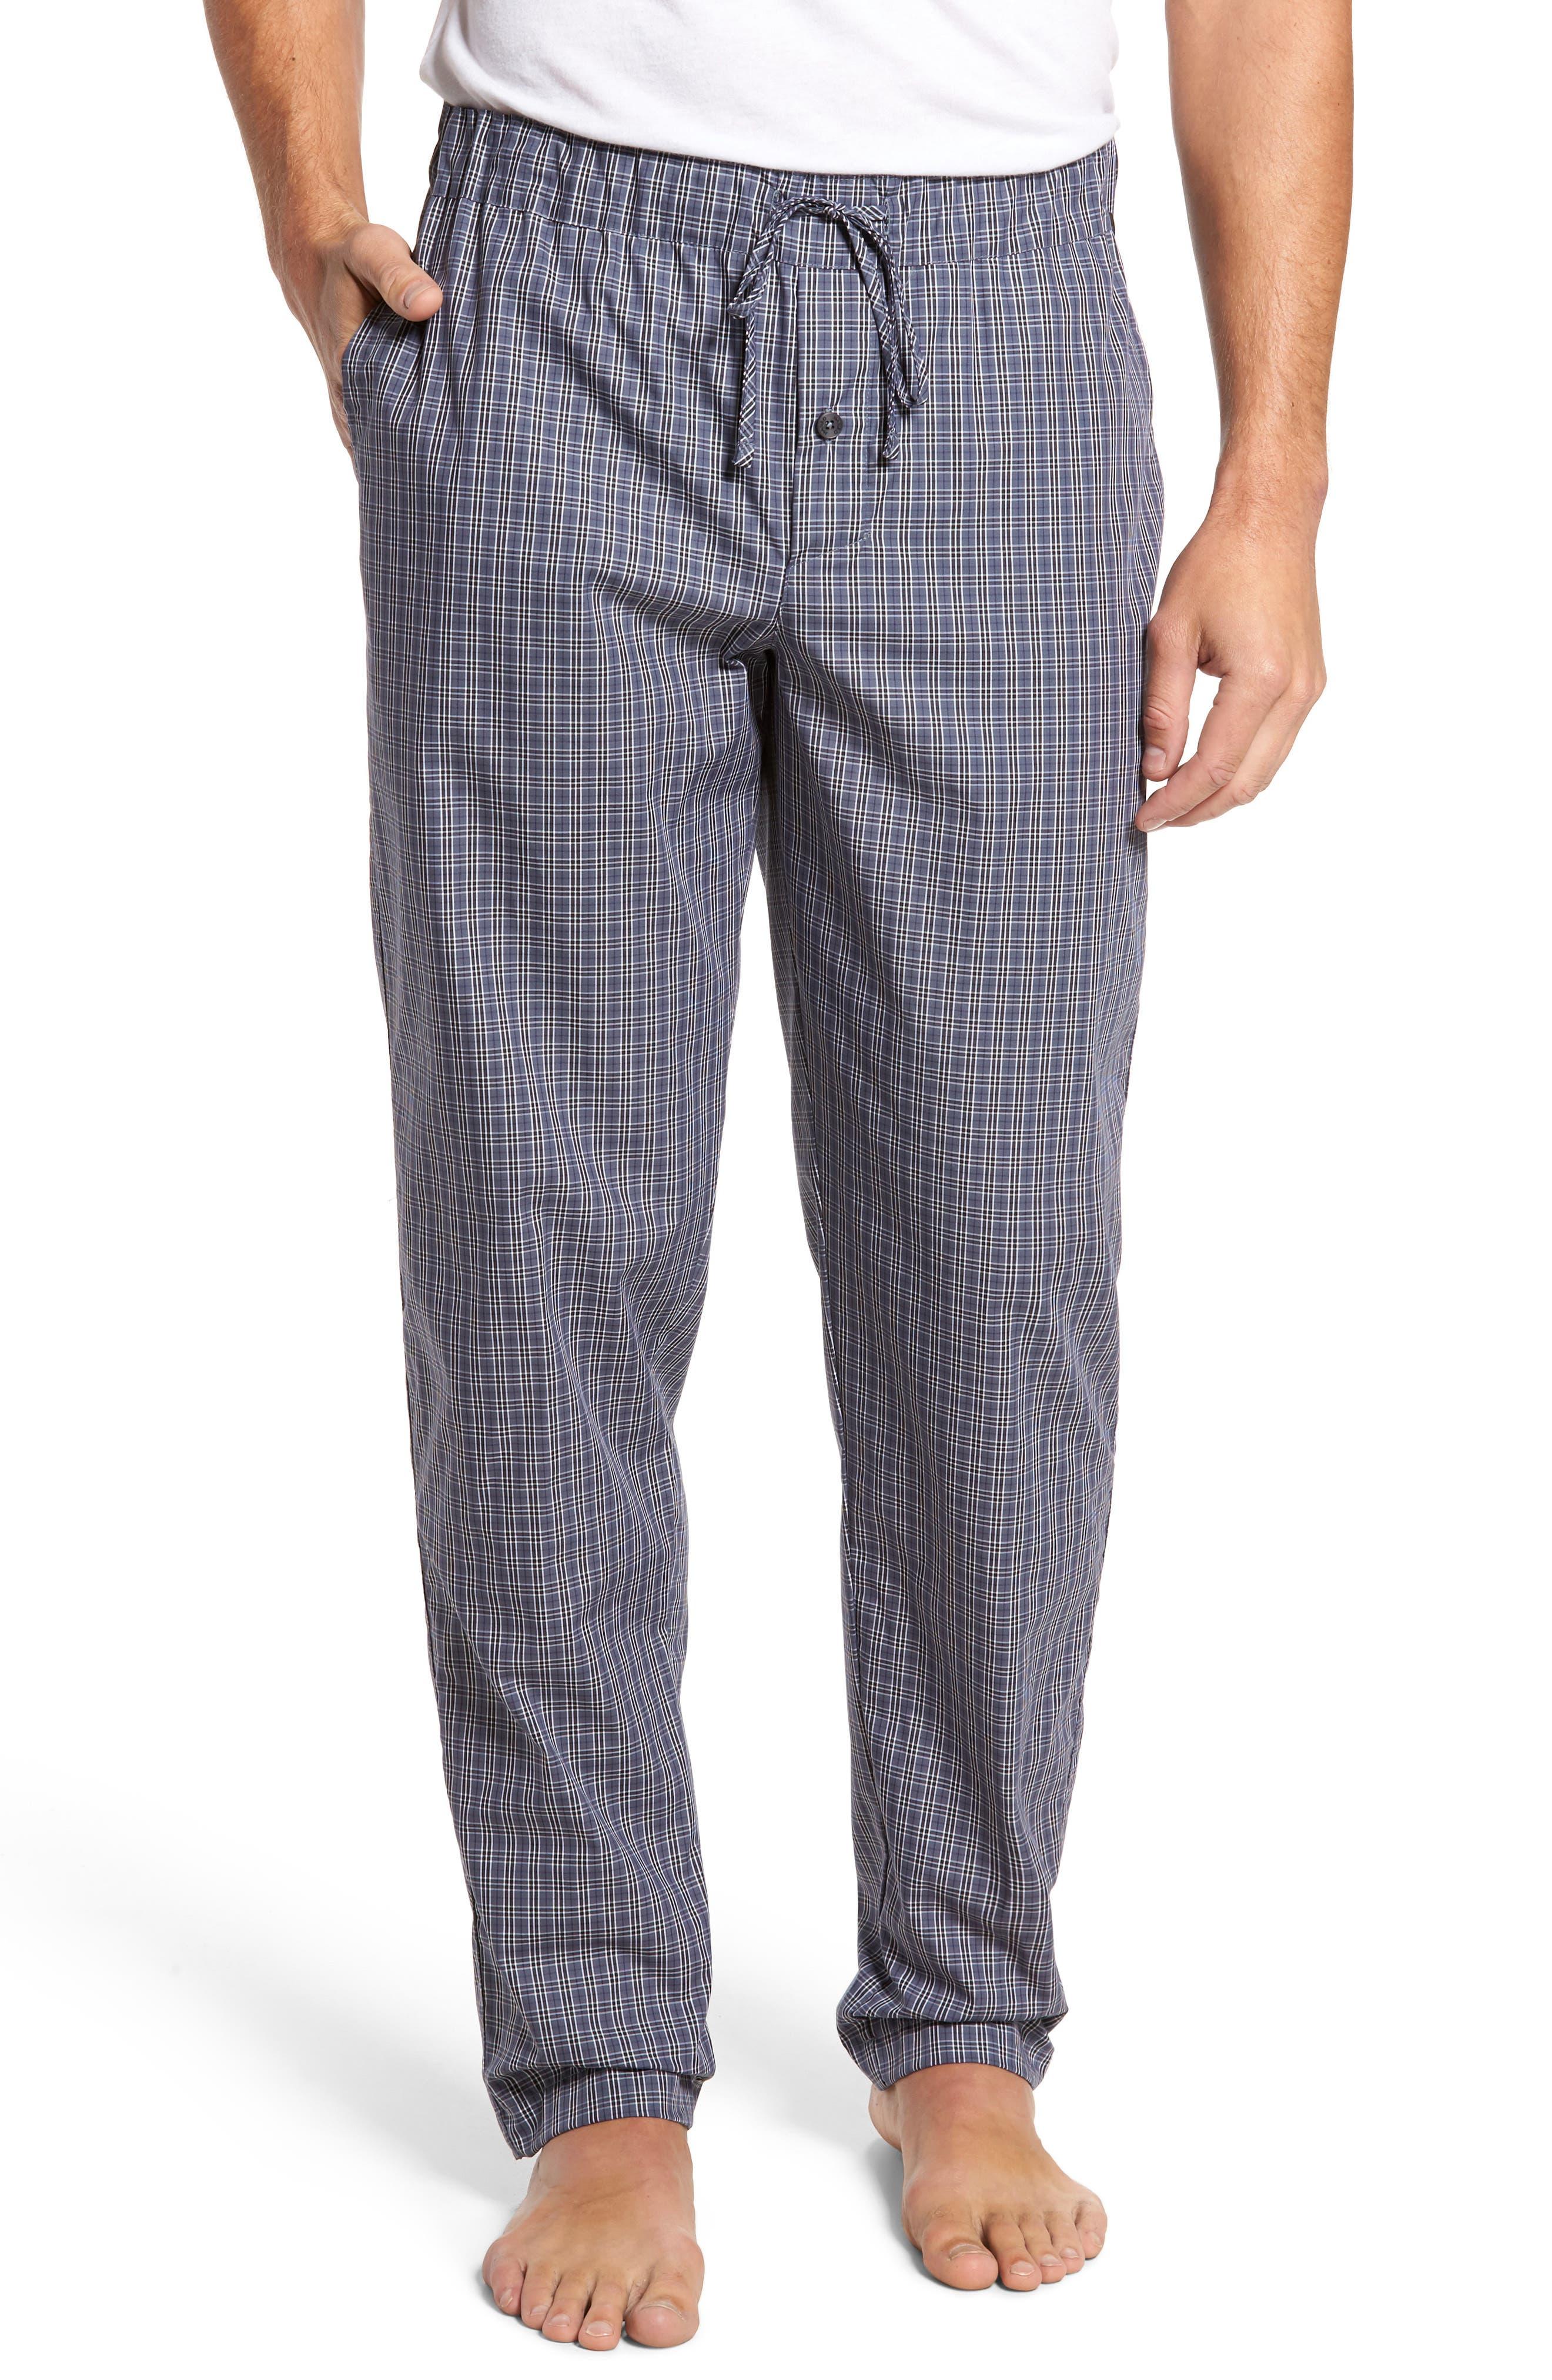 Night & Day Woven Lounge Pants,                             Main thumbnail 1, color,                             GREY CHECK